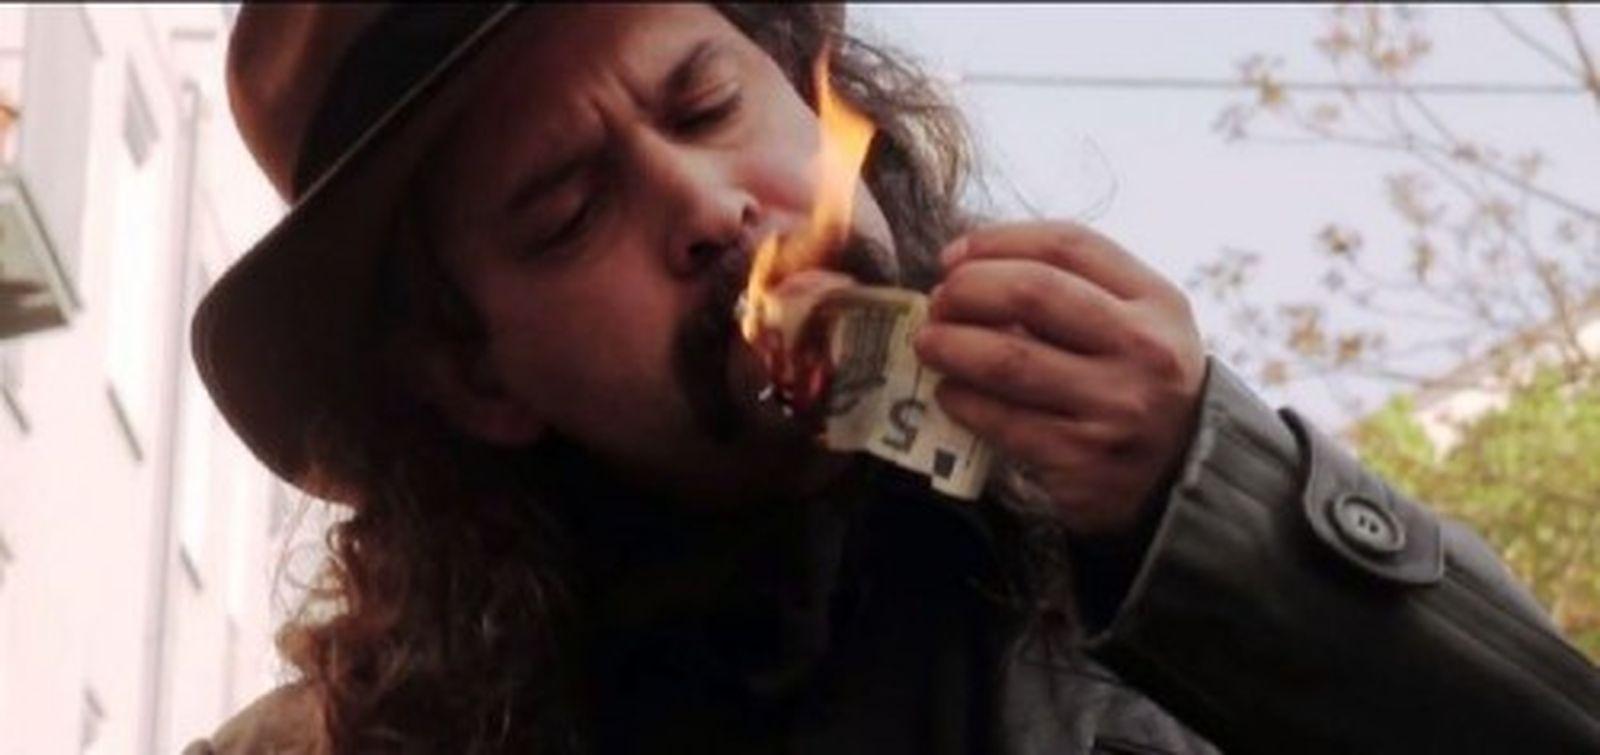 Magnus Hecht als Bösewicht, Foto: Screenshot